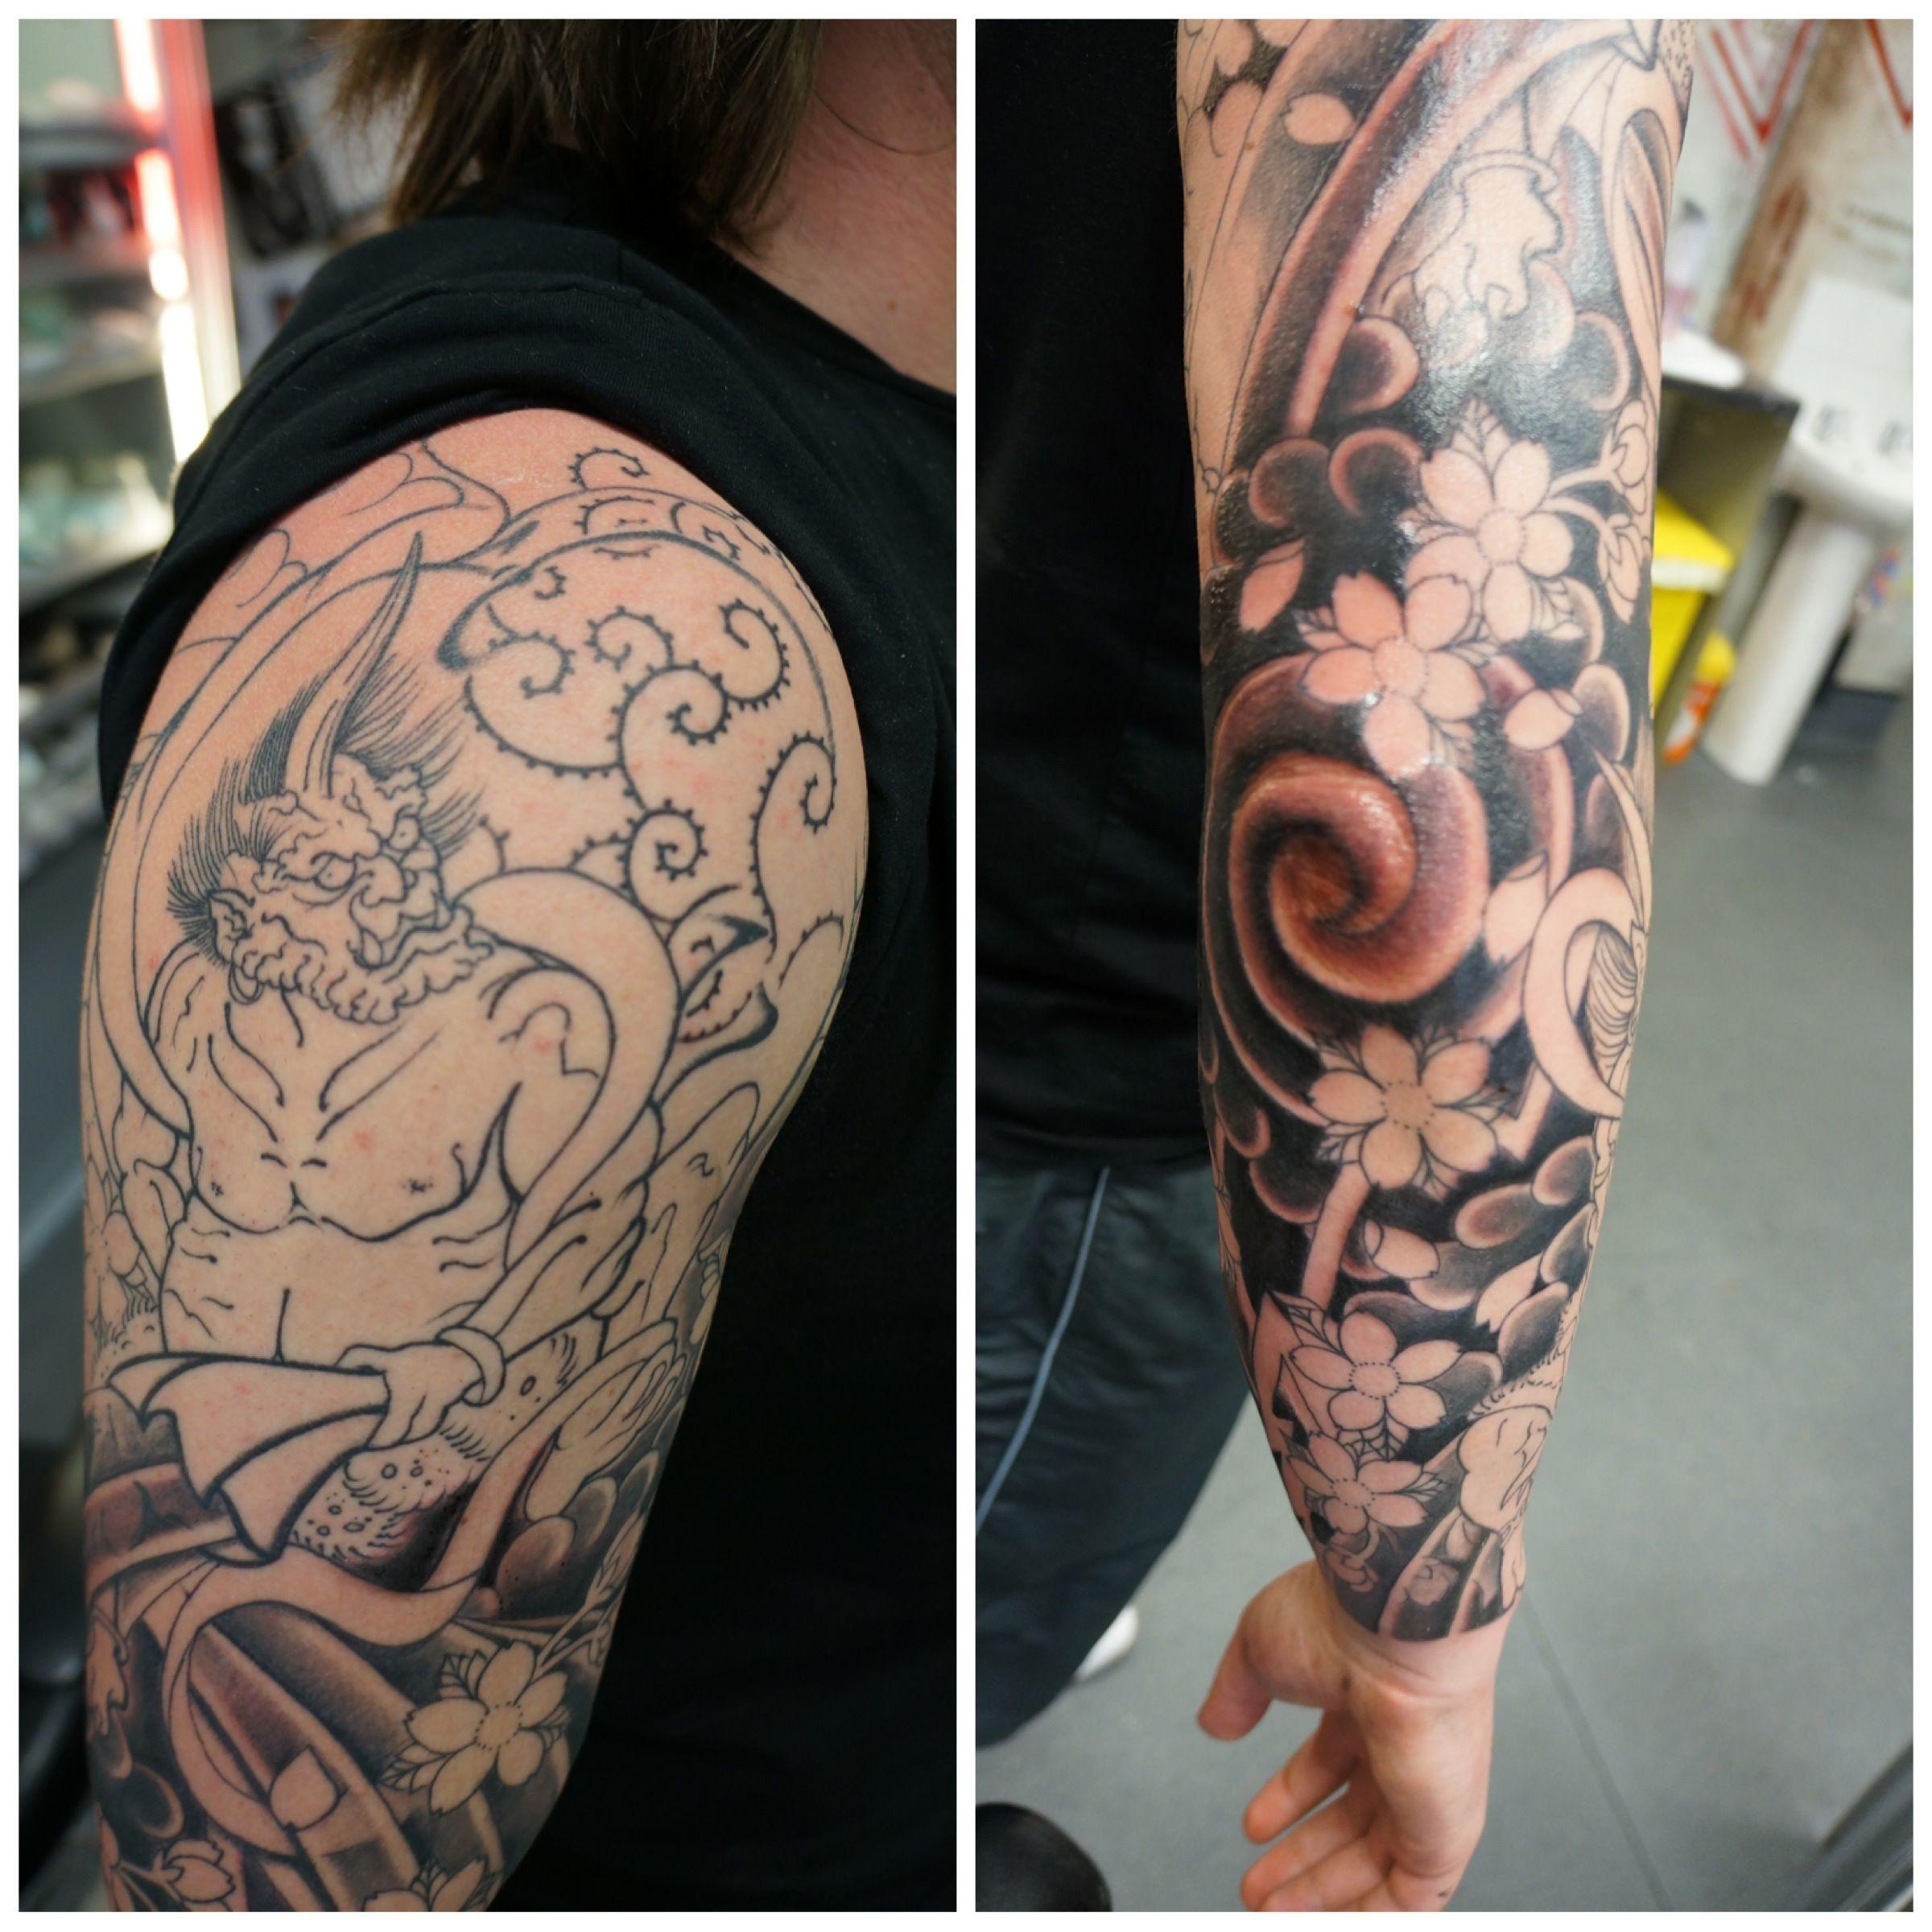 Get Japanese Elbow Tattoo Designs In 2020 Elbow Tattoos Tattoos Swirl Tattoo